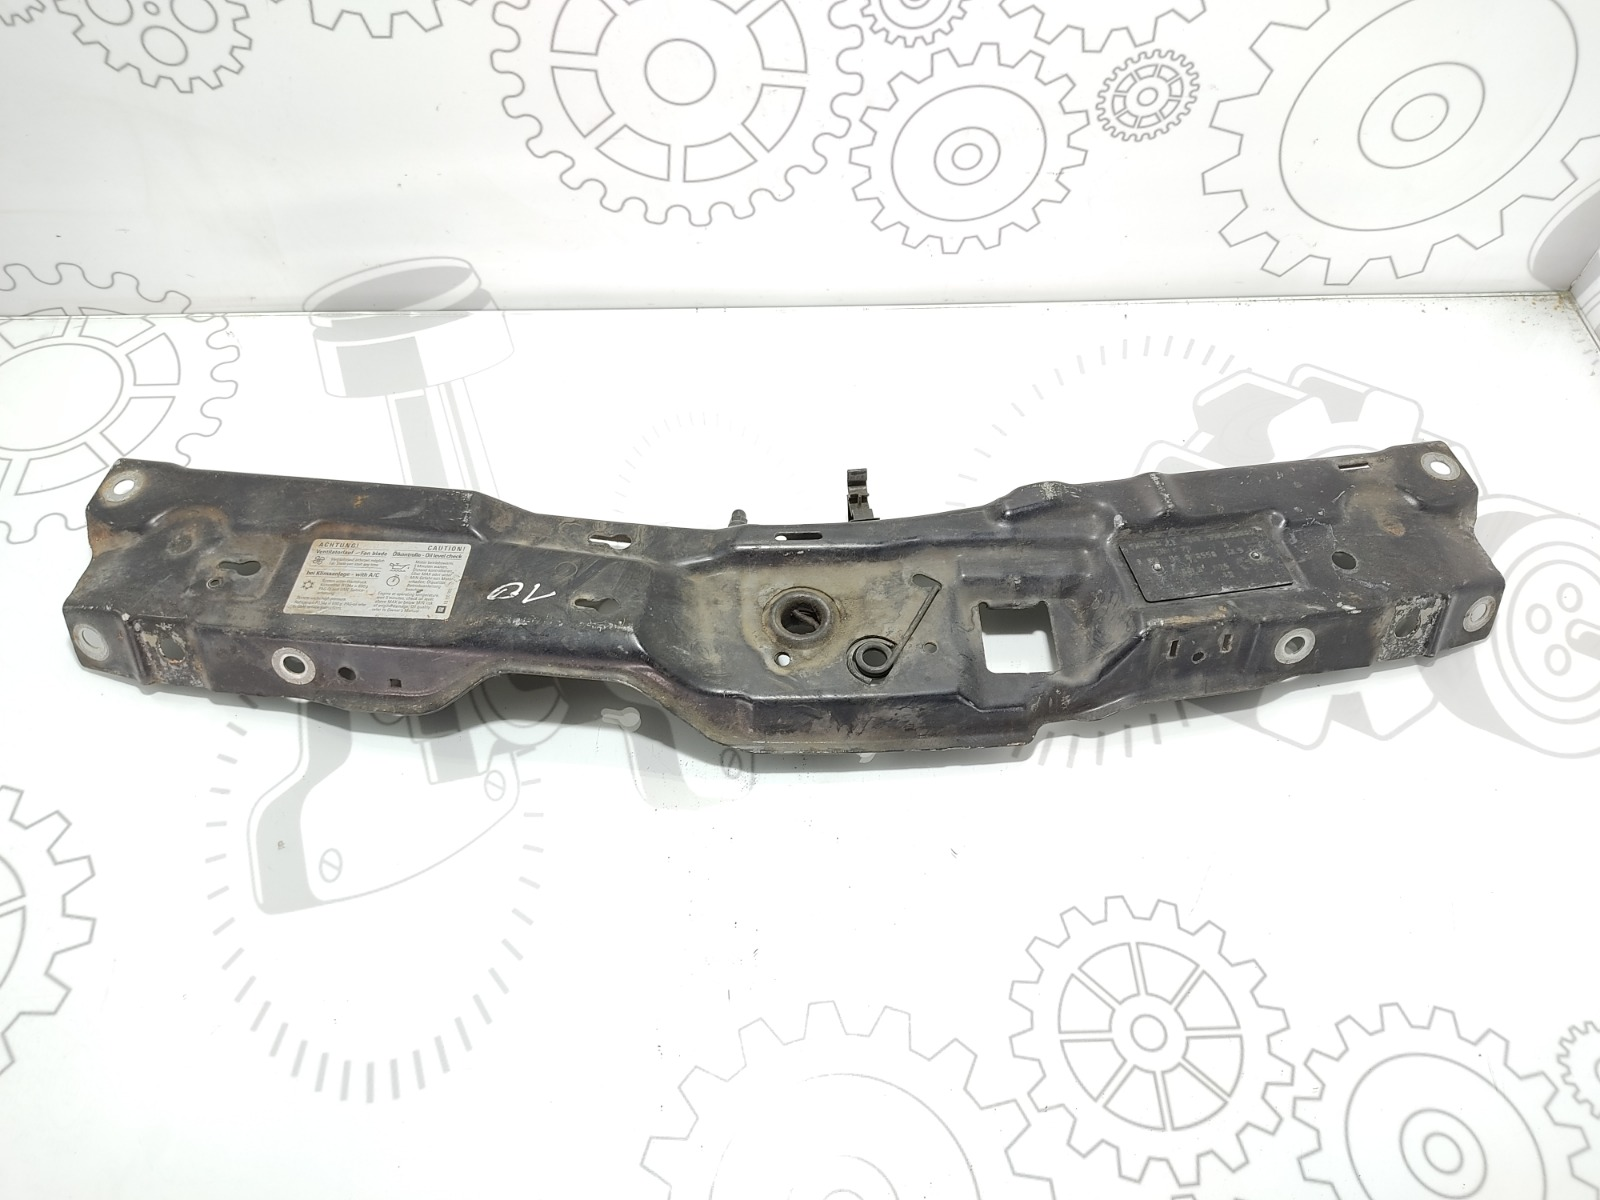 Планка под капот Opel Meriva 1.4 I 2005 (б/у)